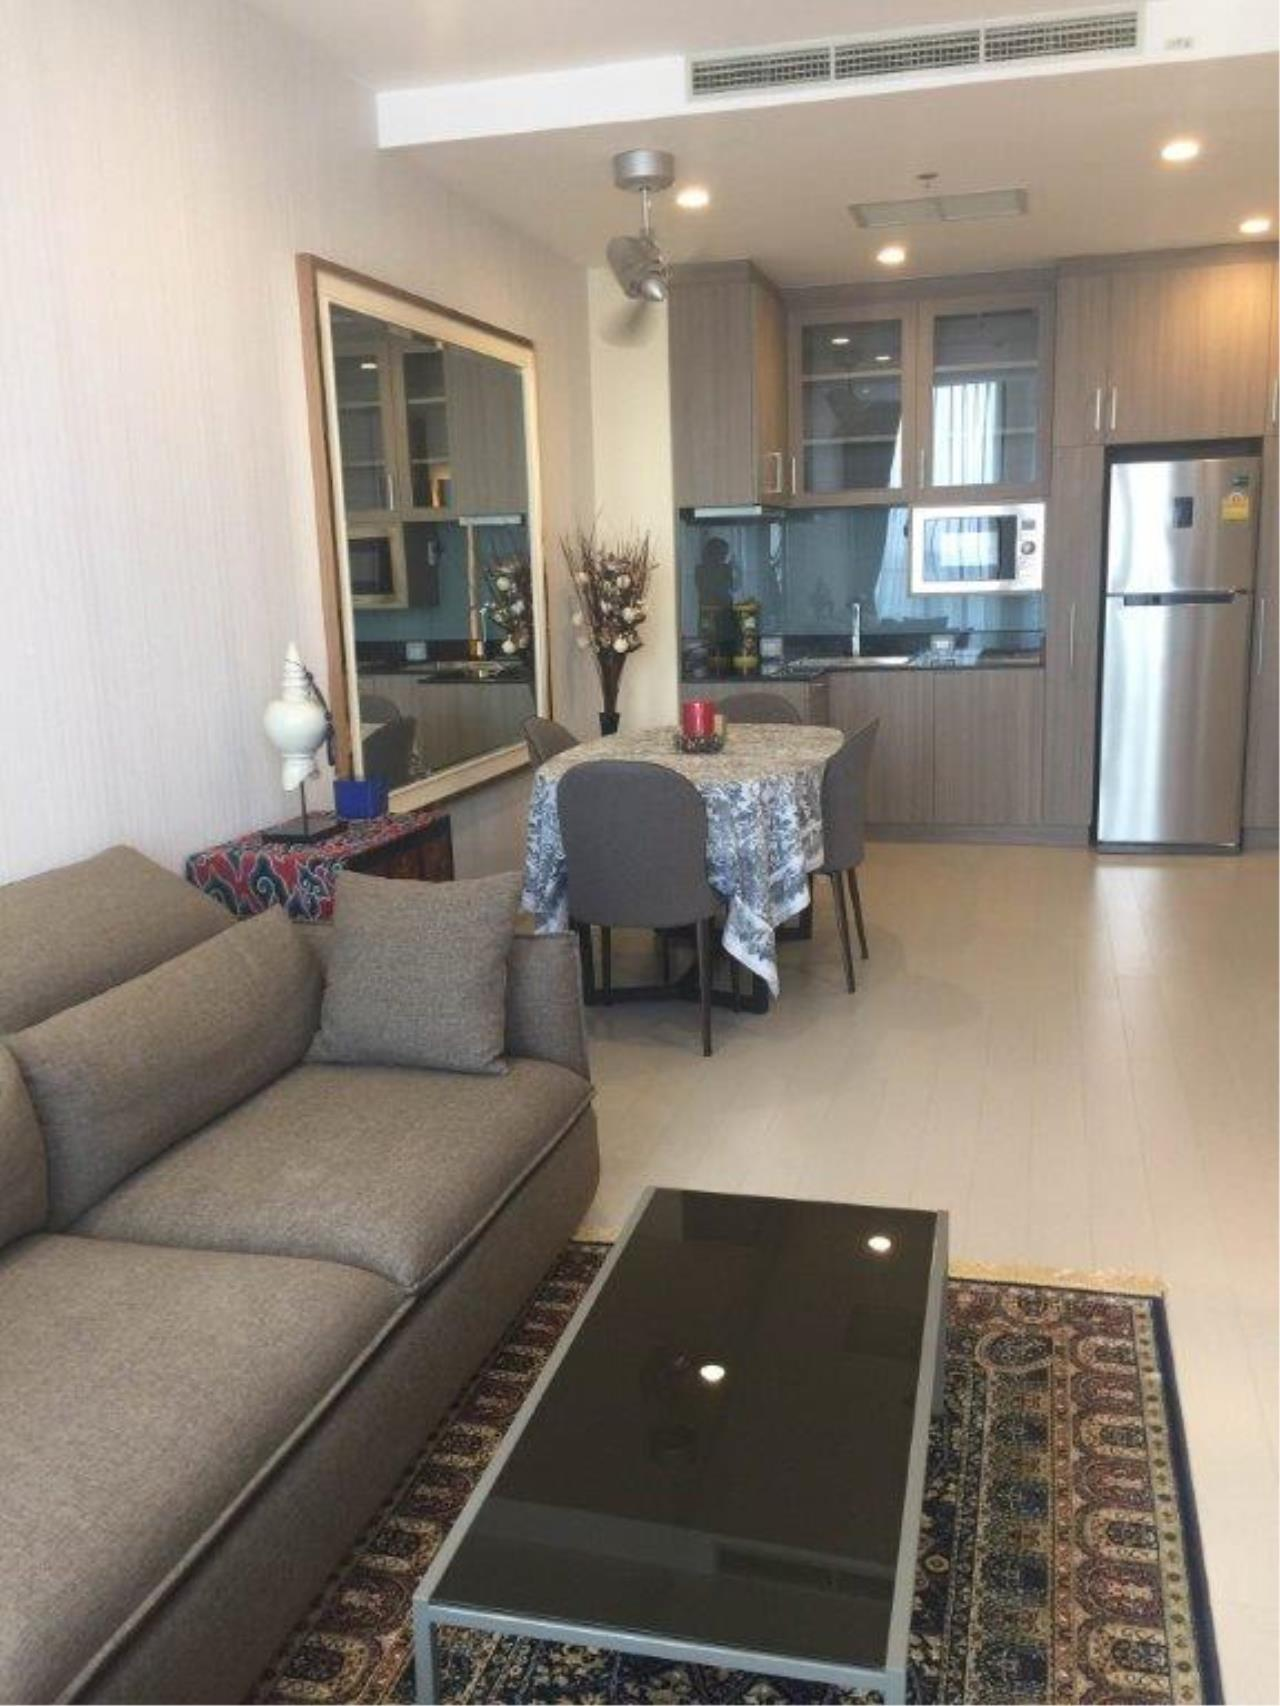 Century21 Skylux Agency's Noble Ploenchit / Condo For Rent / 1 Bedroom / 58.9 SQM / BTS Phloen Chit / Bangkok 2